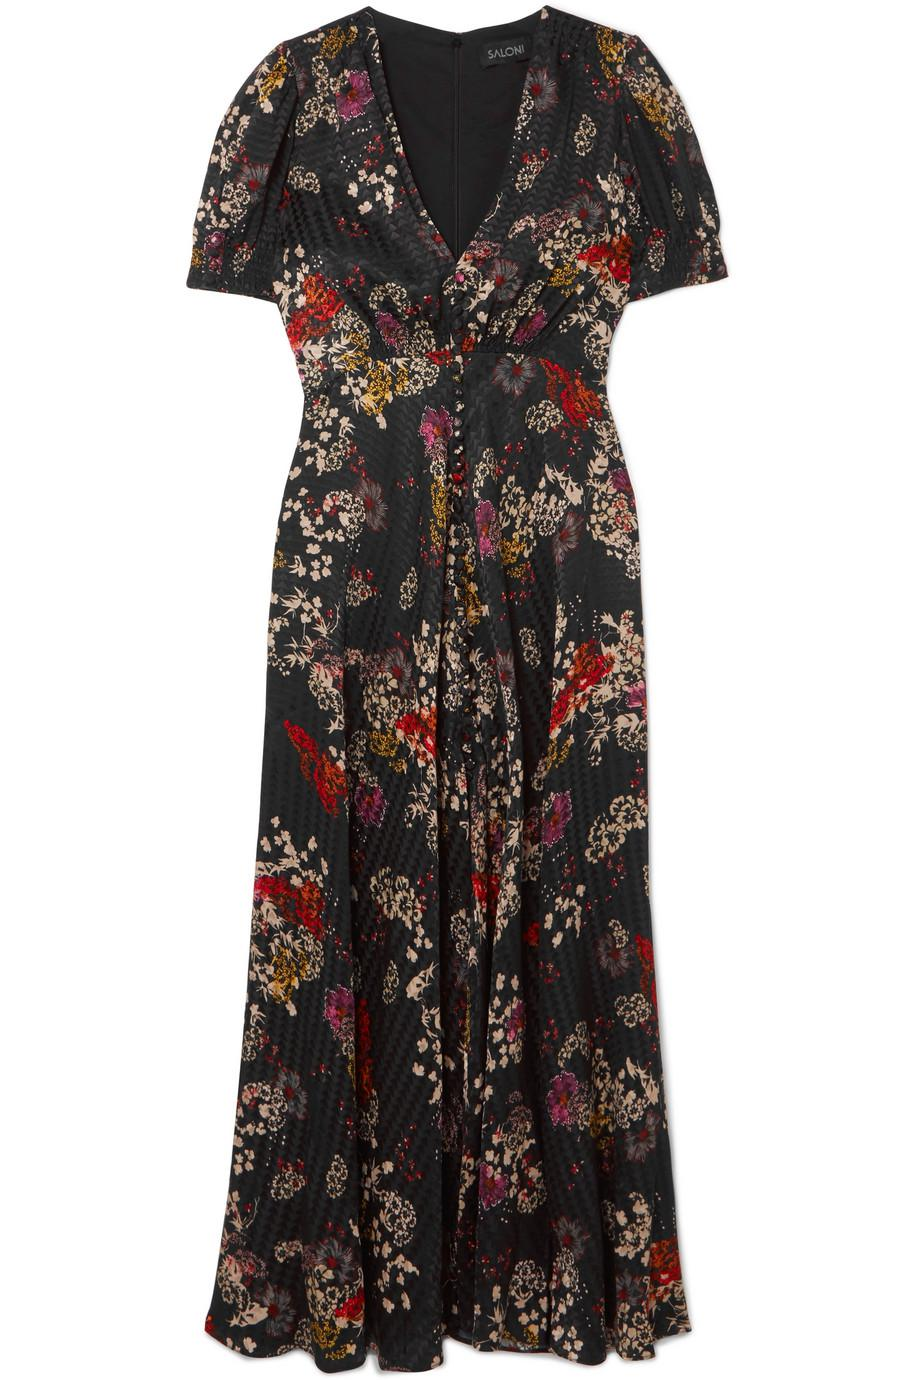 Lea Floral-print Silk Crepe De Chine Midi Dress - Fuchsia Saloni Best Choice Discount Sale Free Shipping Recommend D58Wt